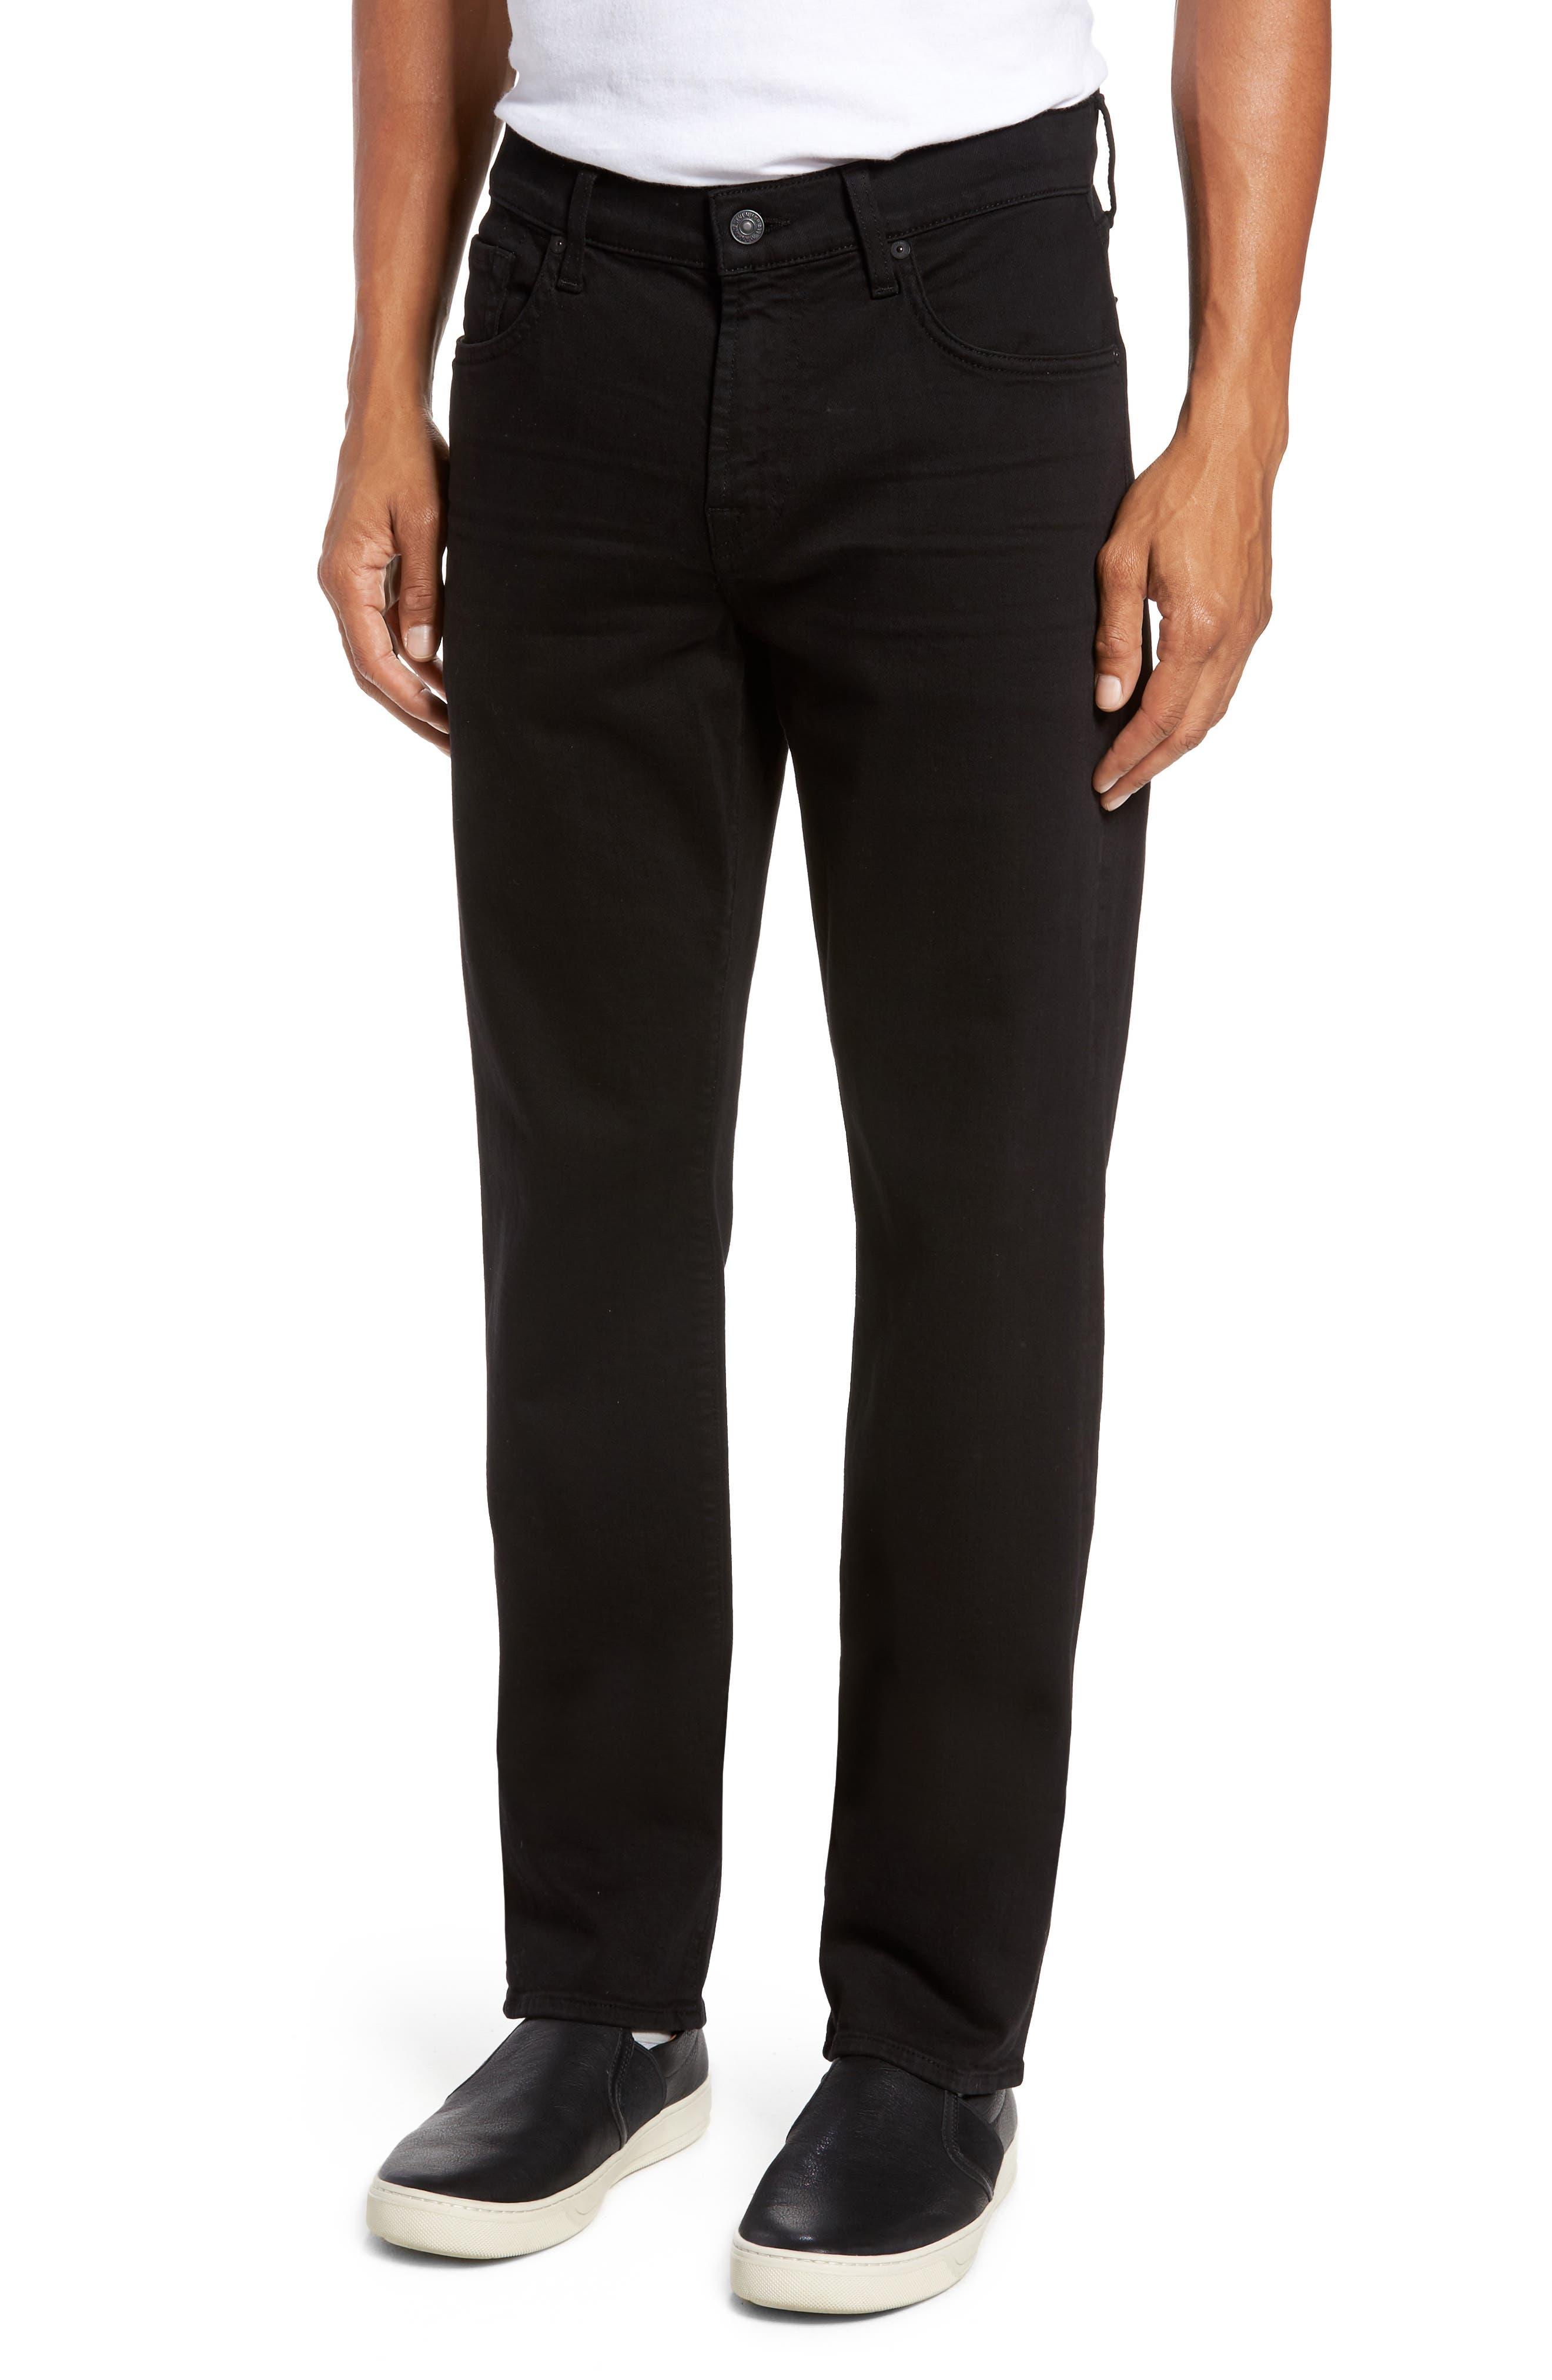 Luxe Performance - Slimmy Slim Fit Jeans,                             Main thumbnail 1, color,                             ANNEX BLACK